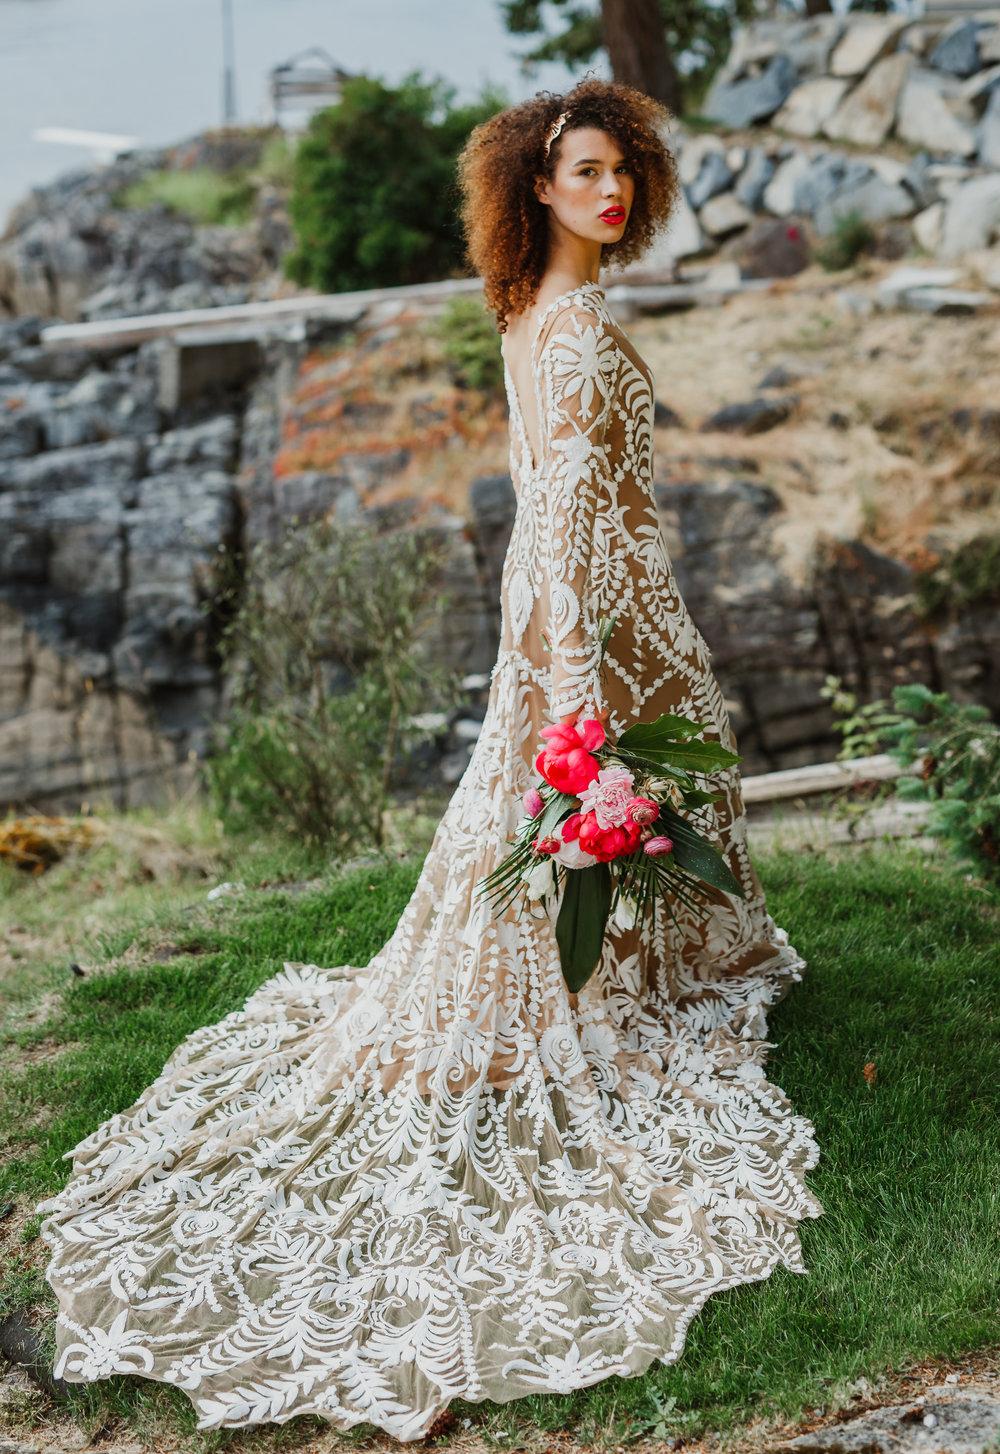 West Coast Bride - Vancouver Wedding Photographer & Videographer - Sunshine Coast Wedding Photos - Sunshine Coast Wedding Photographer - Jennifer Picard Photography - IMG_7117.jpg